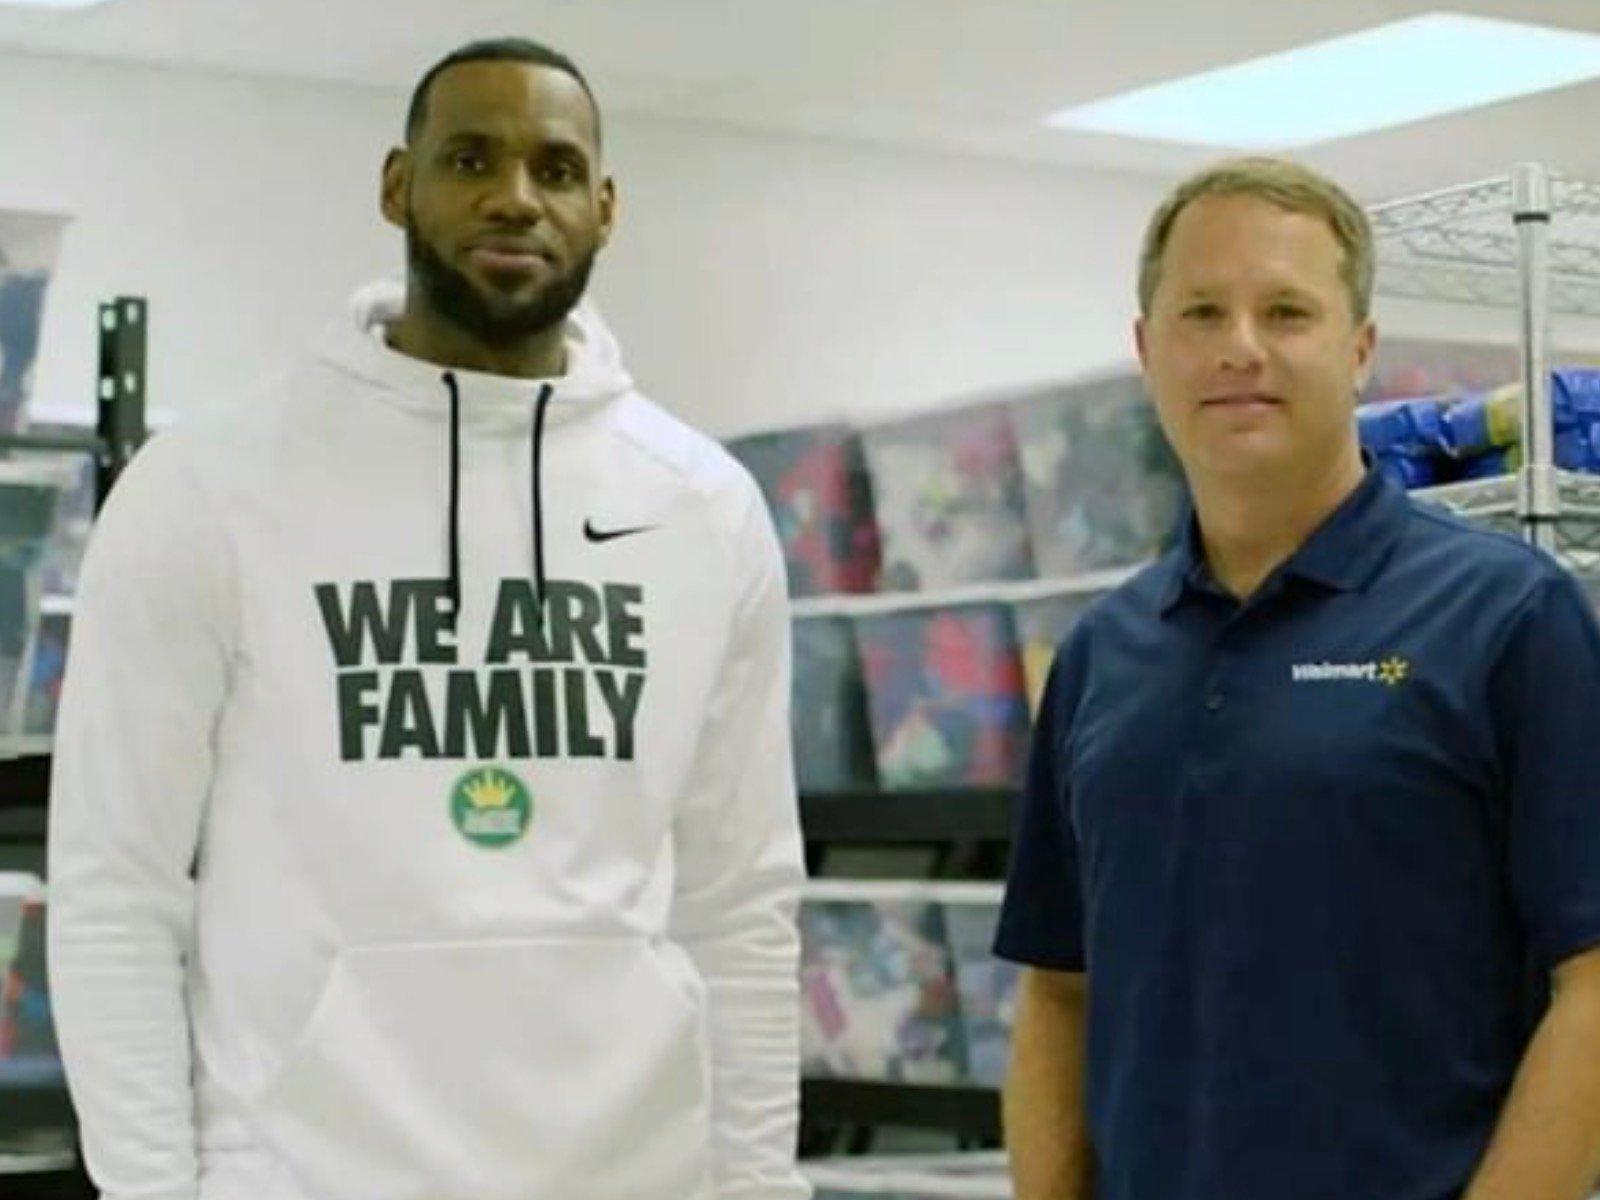 LeBron James Wal-Mart